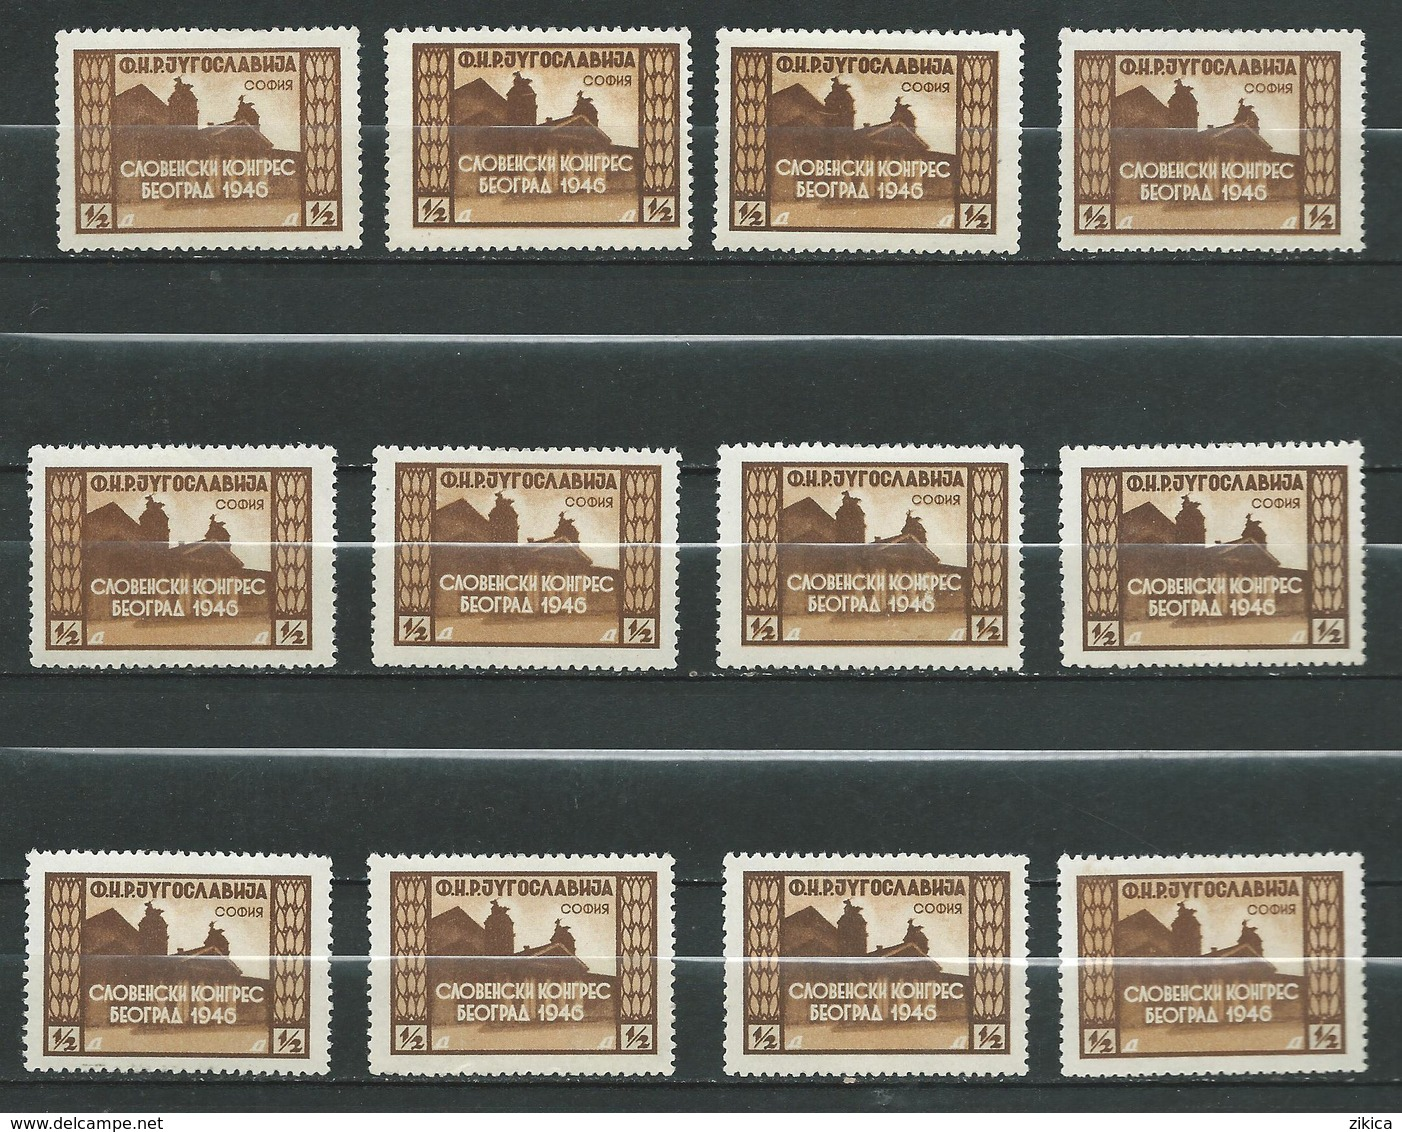 Yugoslavia 1948 Slav Congress - Lot 12 Stamps - National Theater In Sofia,Bulgaria - MNH** - 1945-1992 Sozialistische Föderative Republik Jugoslawien